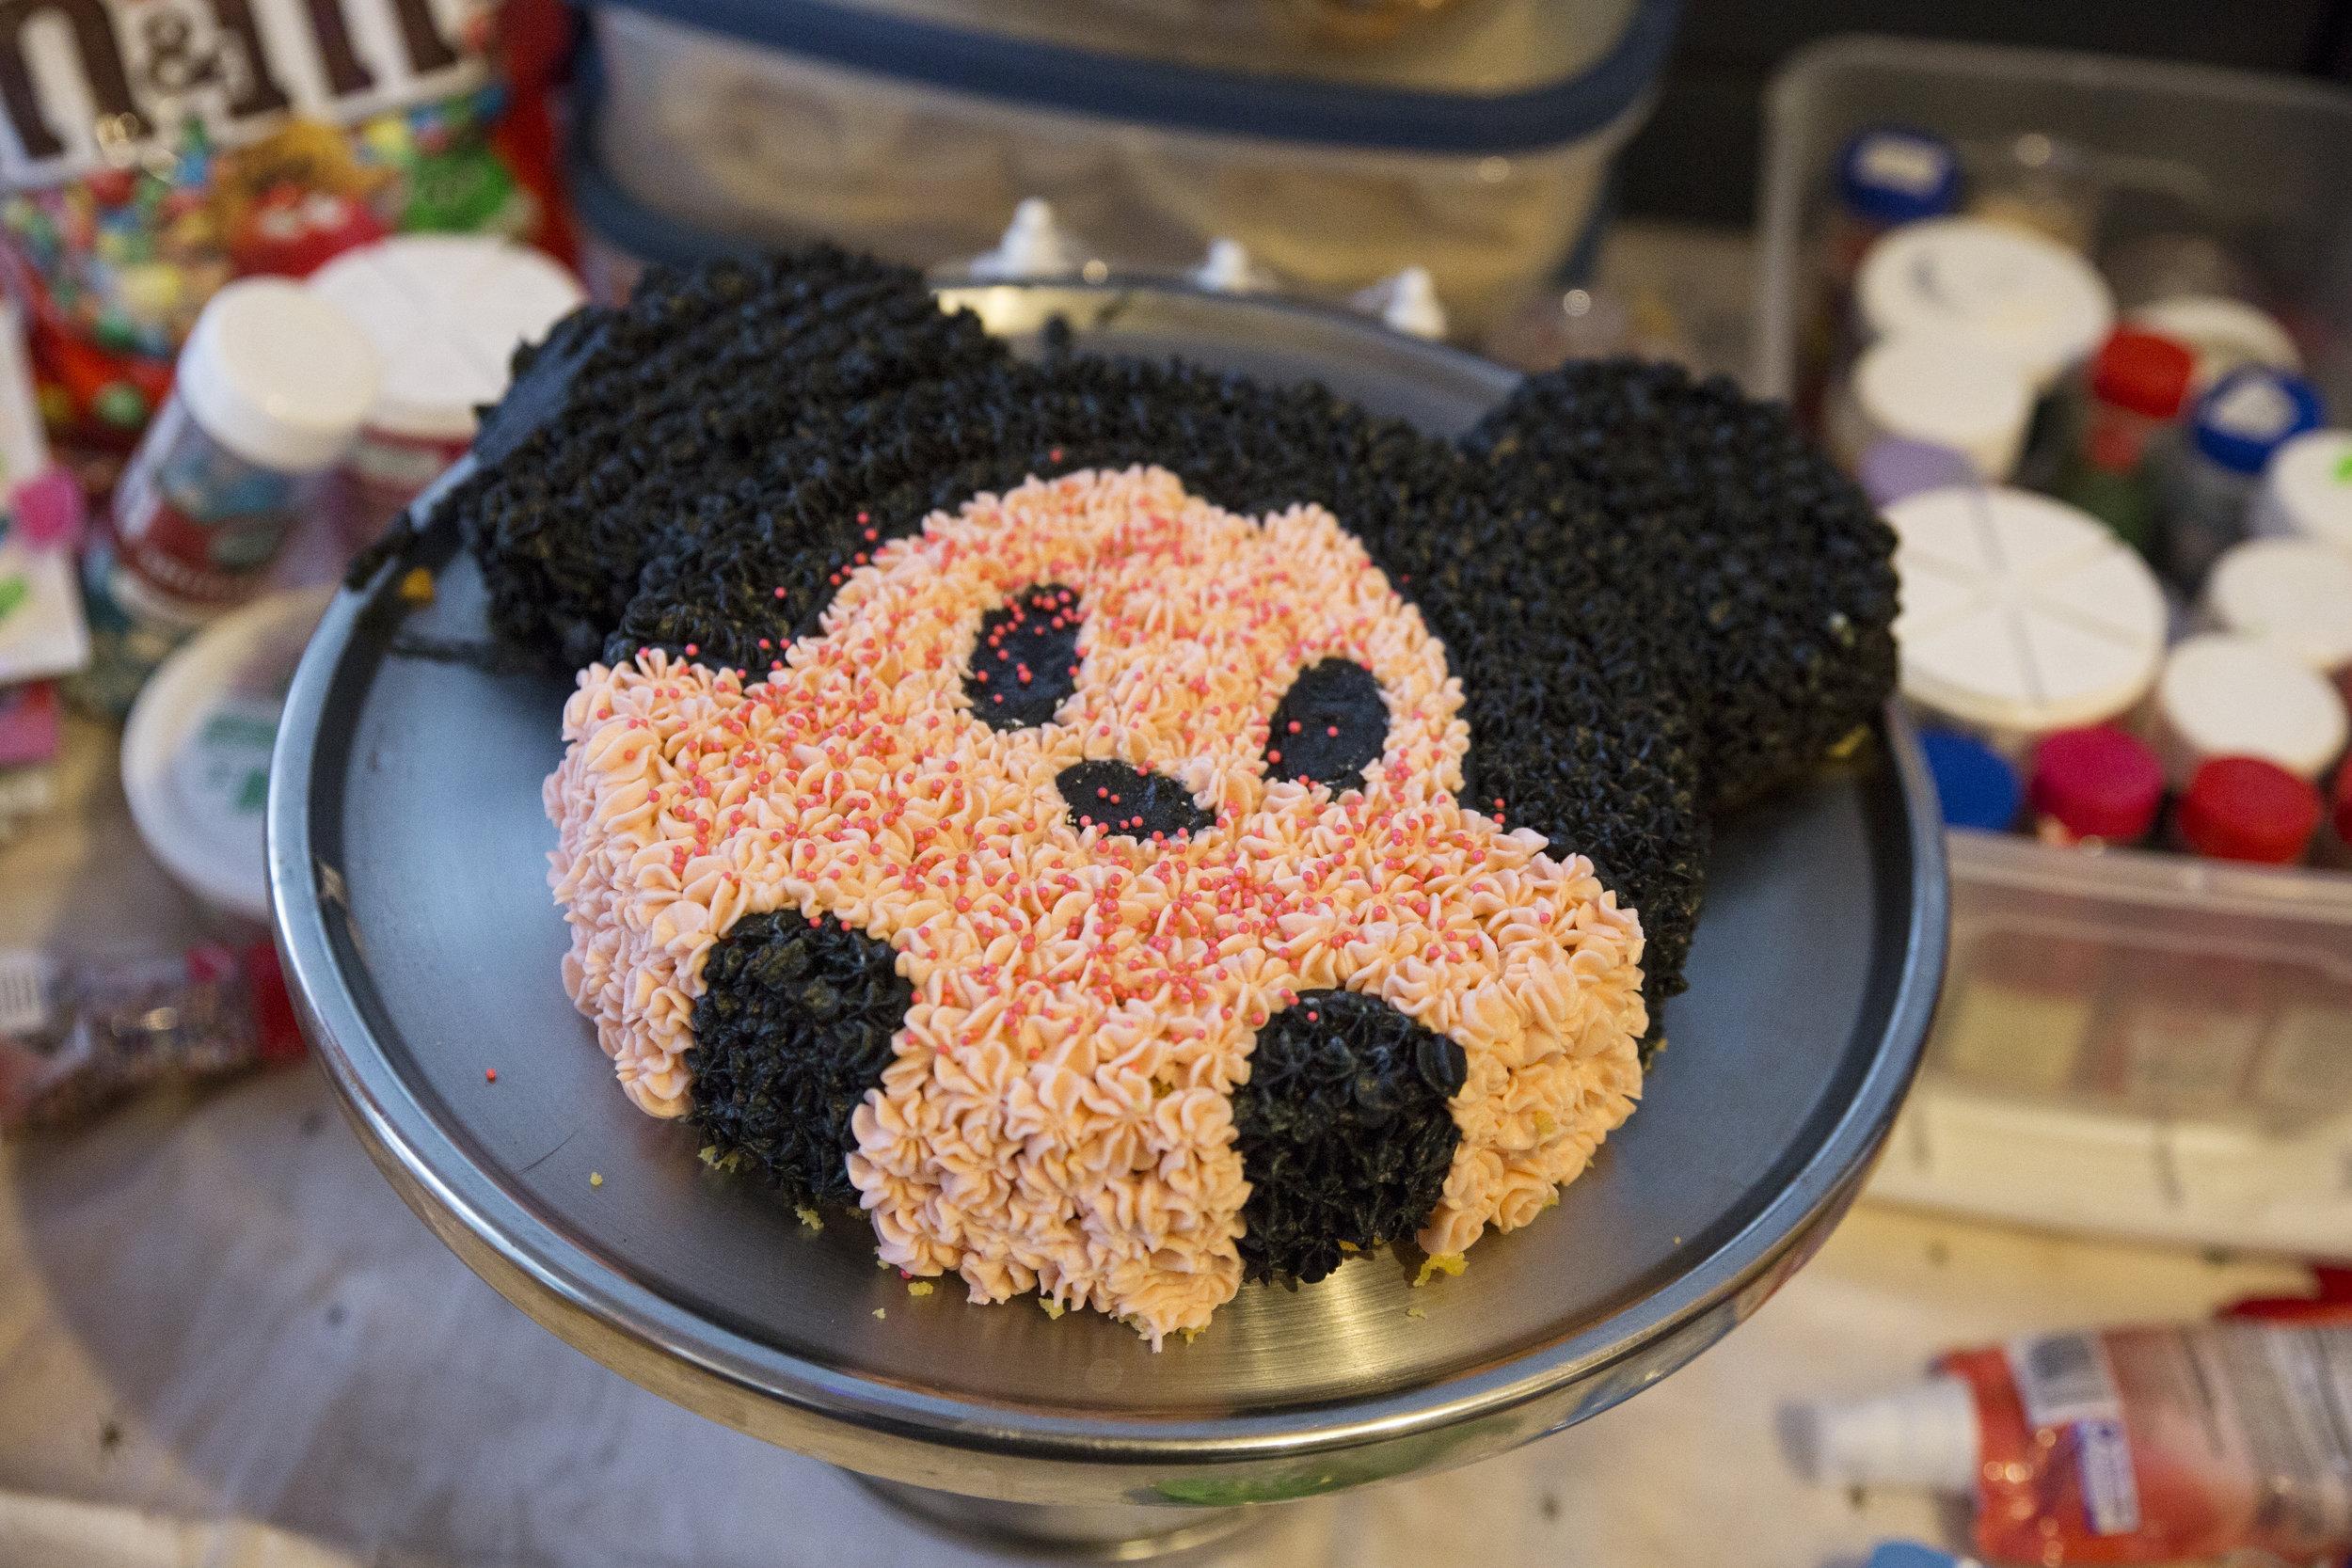 Cake by Gayle Ringrose. Sprinkles by Emmalynn